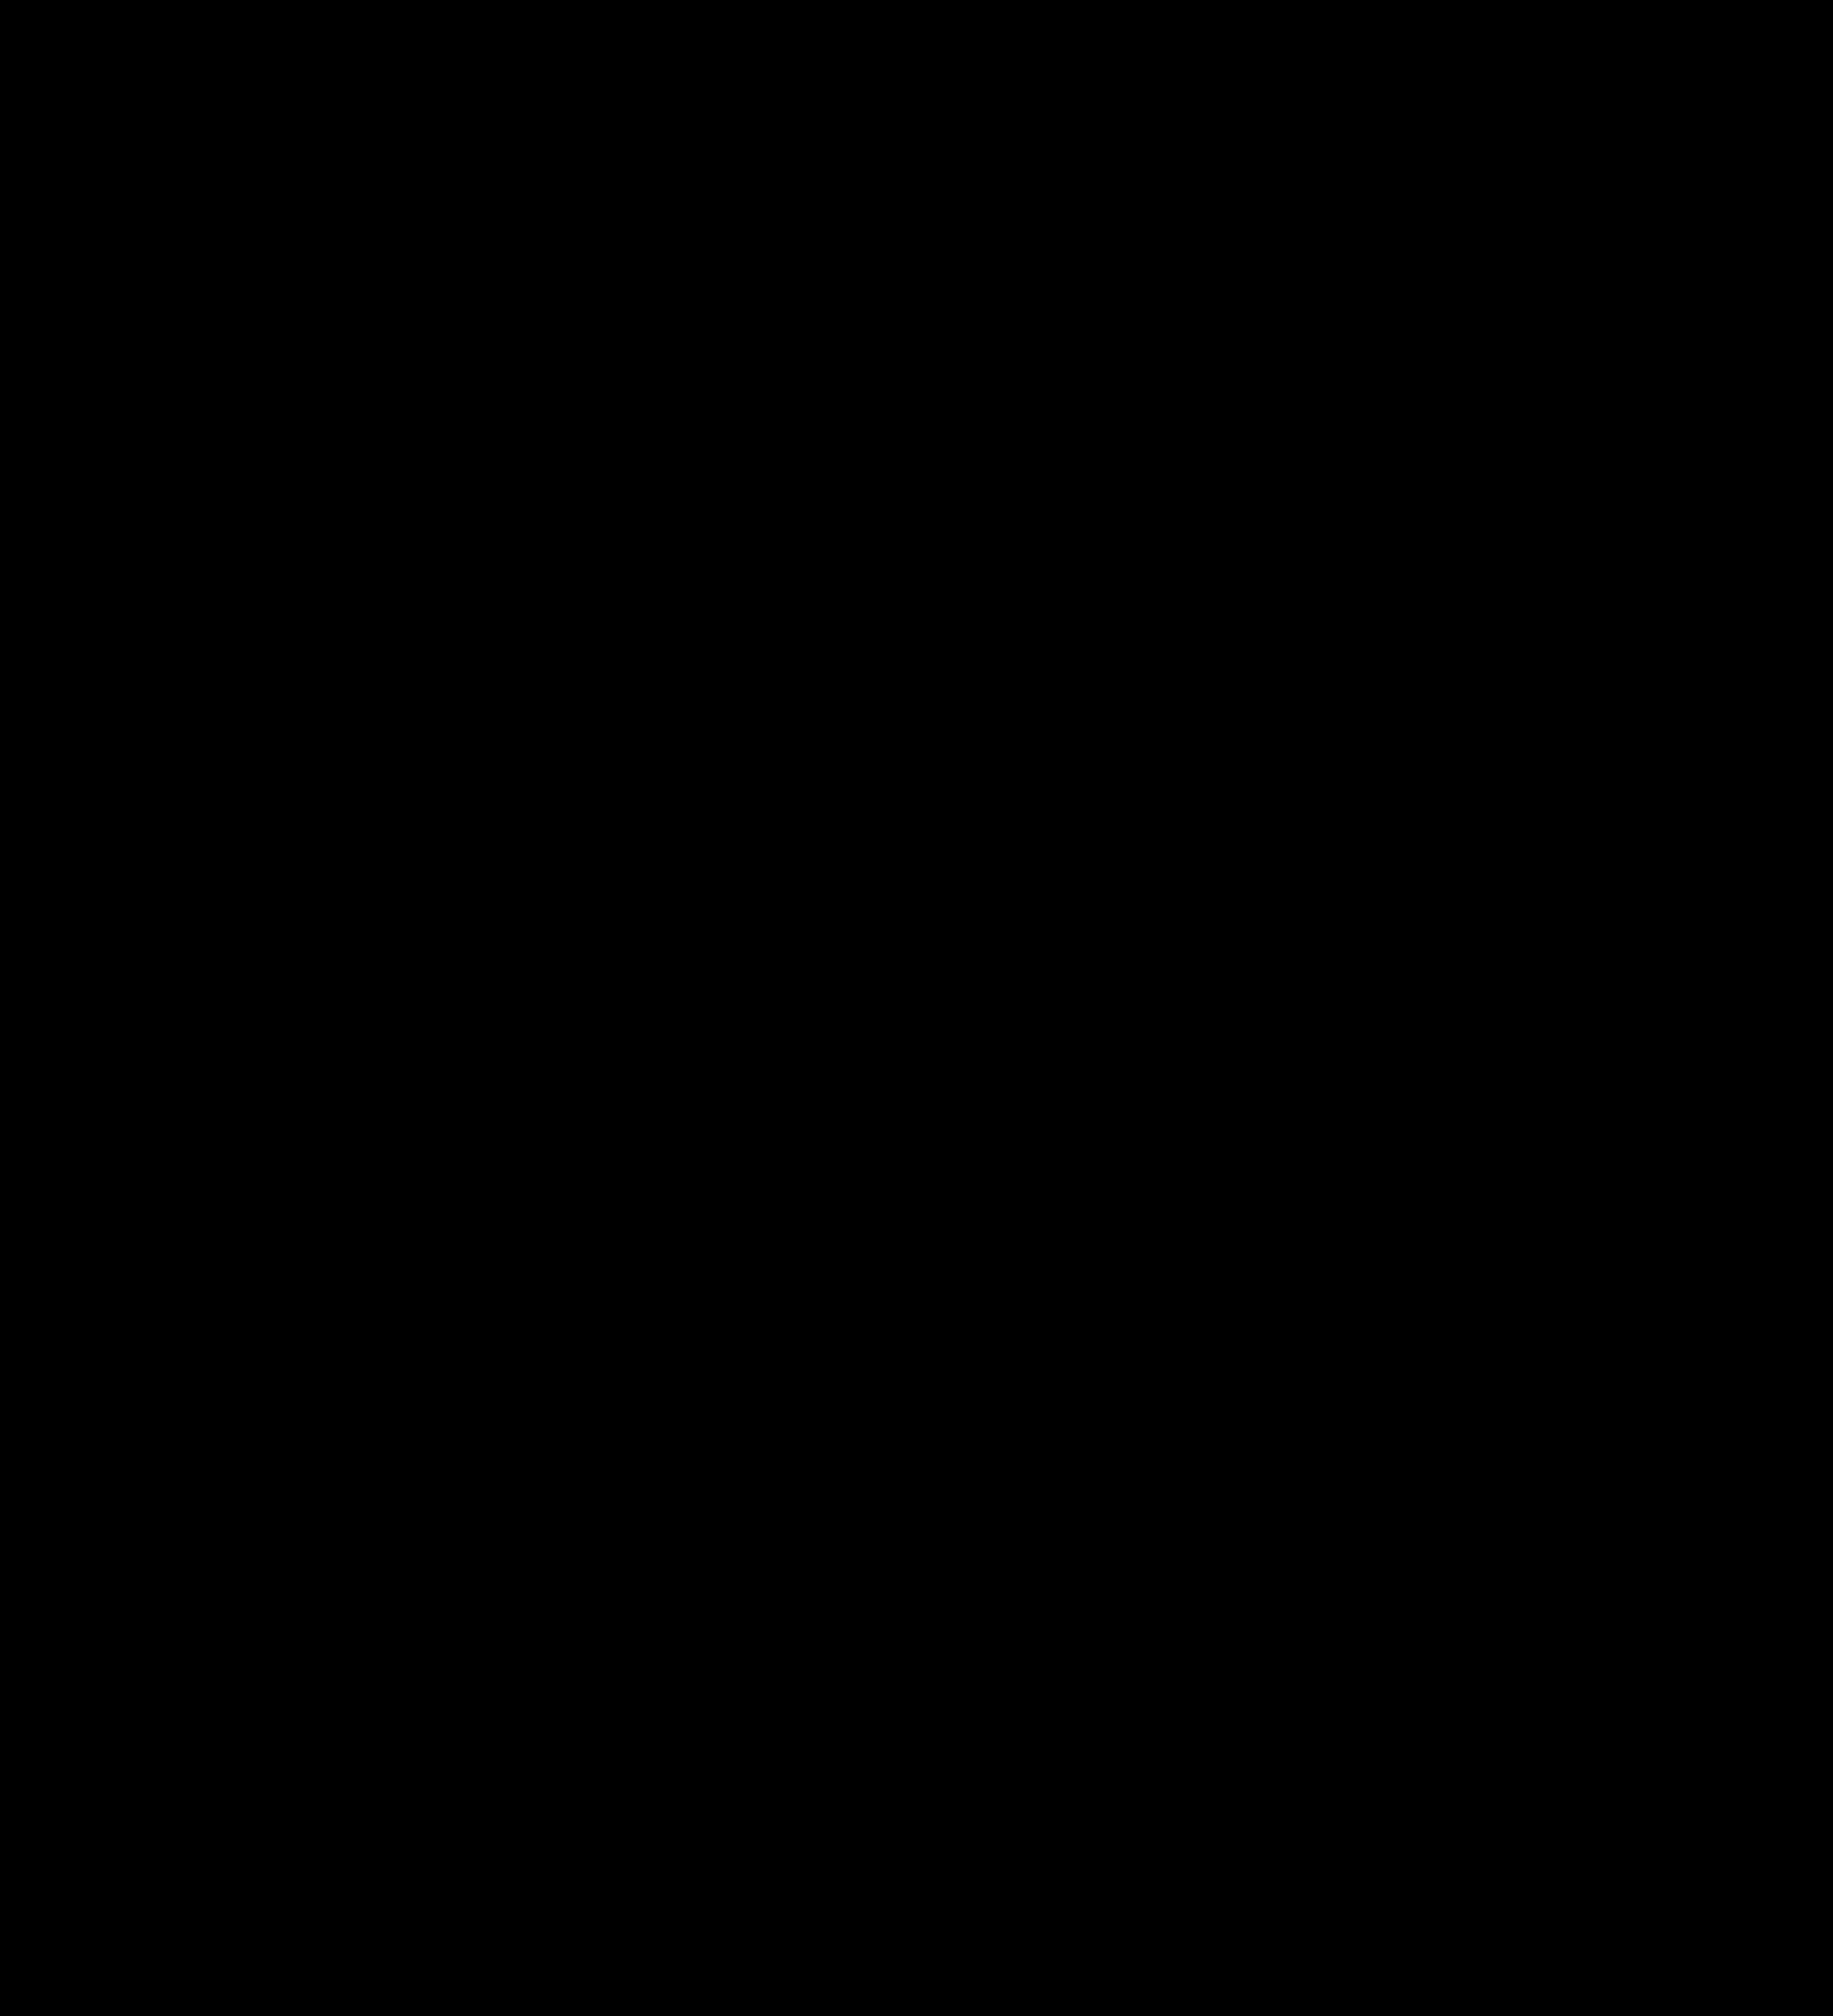 2049x2254 Clipart